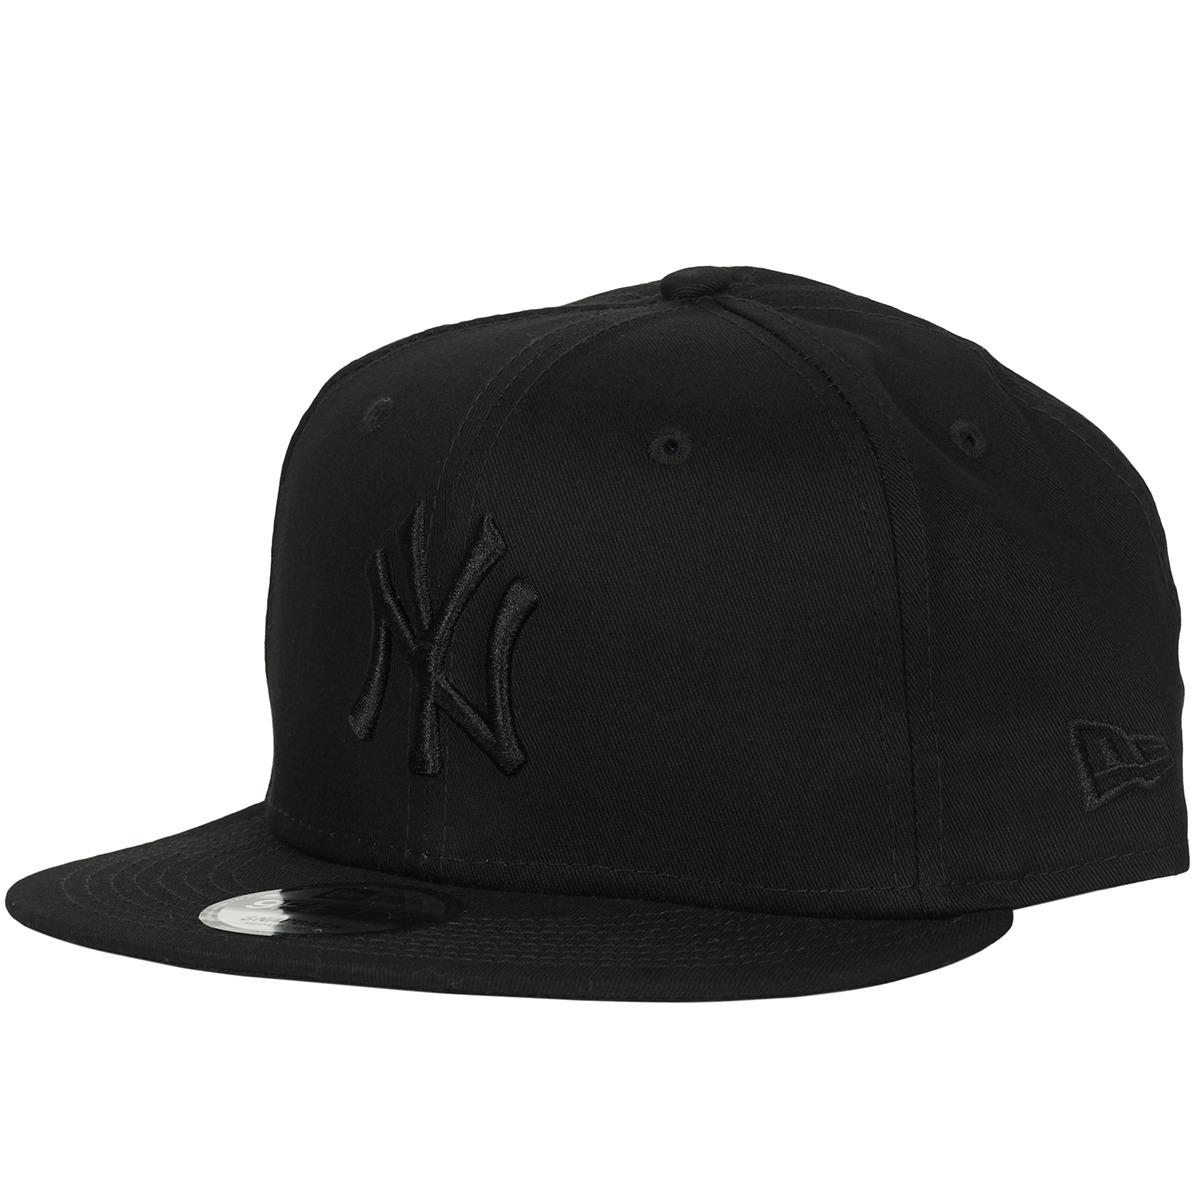 Kasketter New-Era  MLB 9FIFTY NEW YORK YANKEES